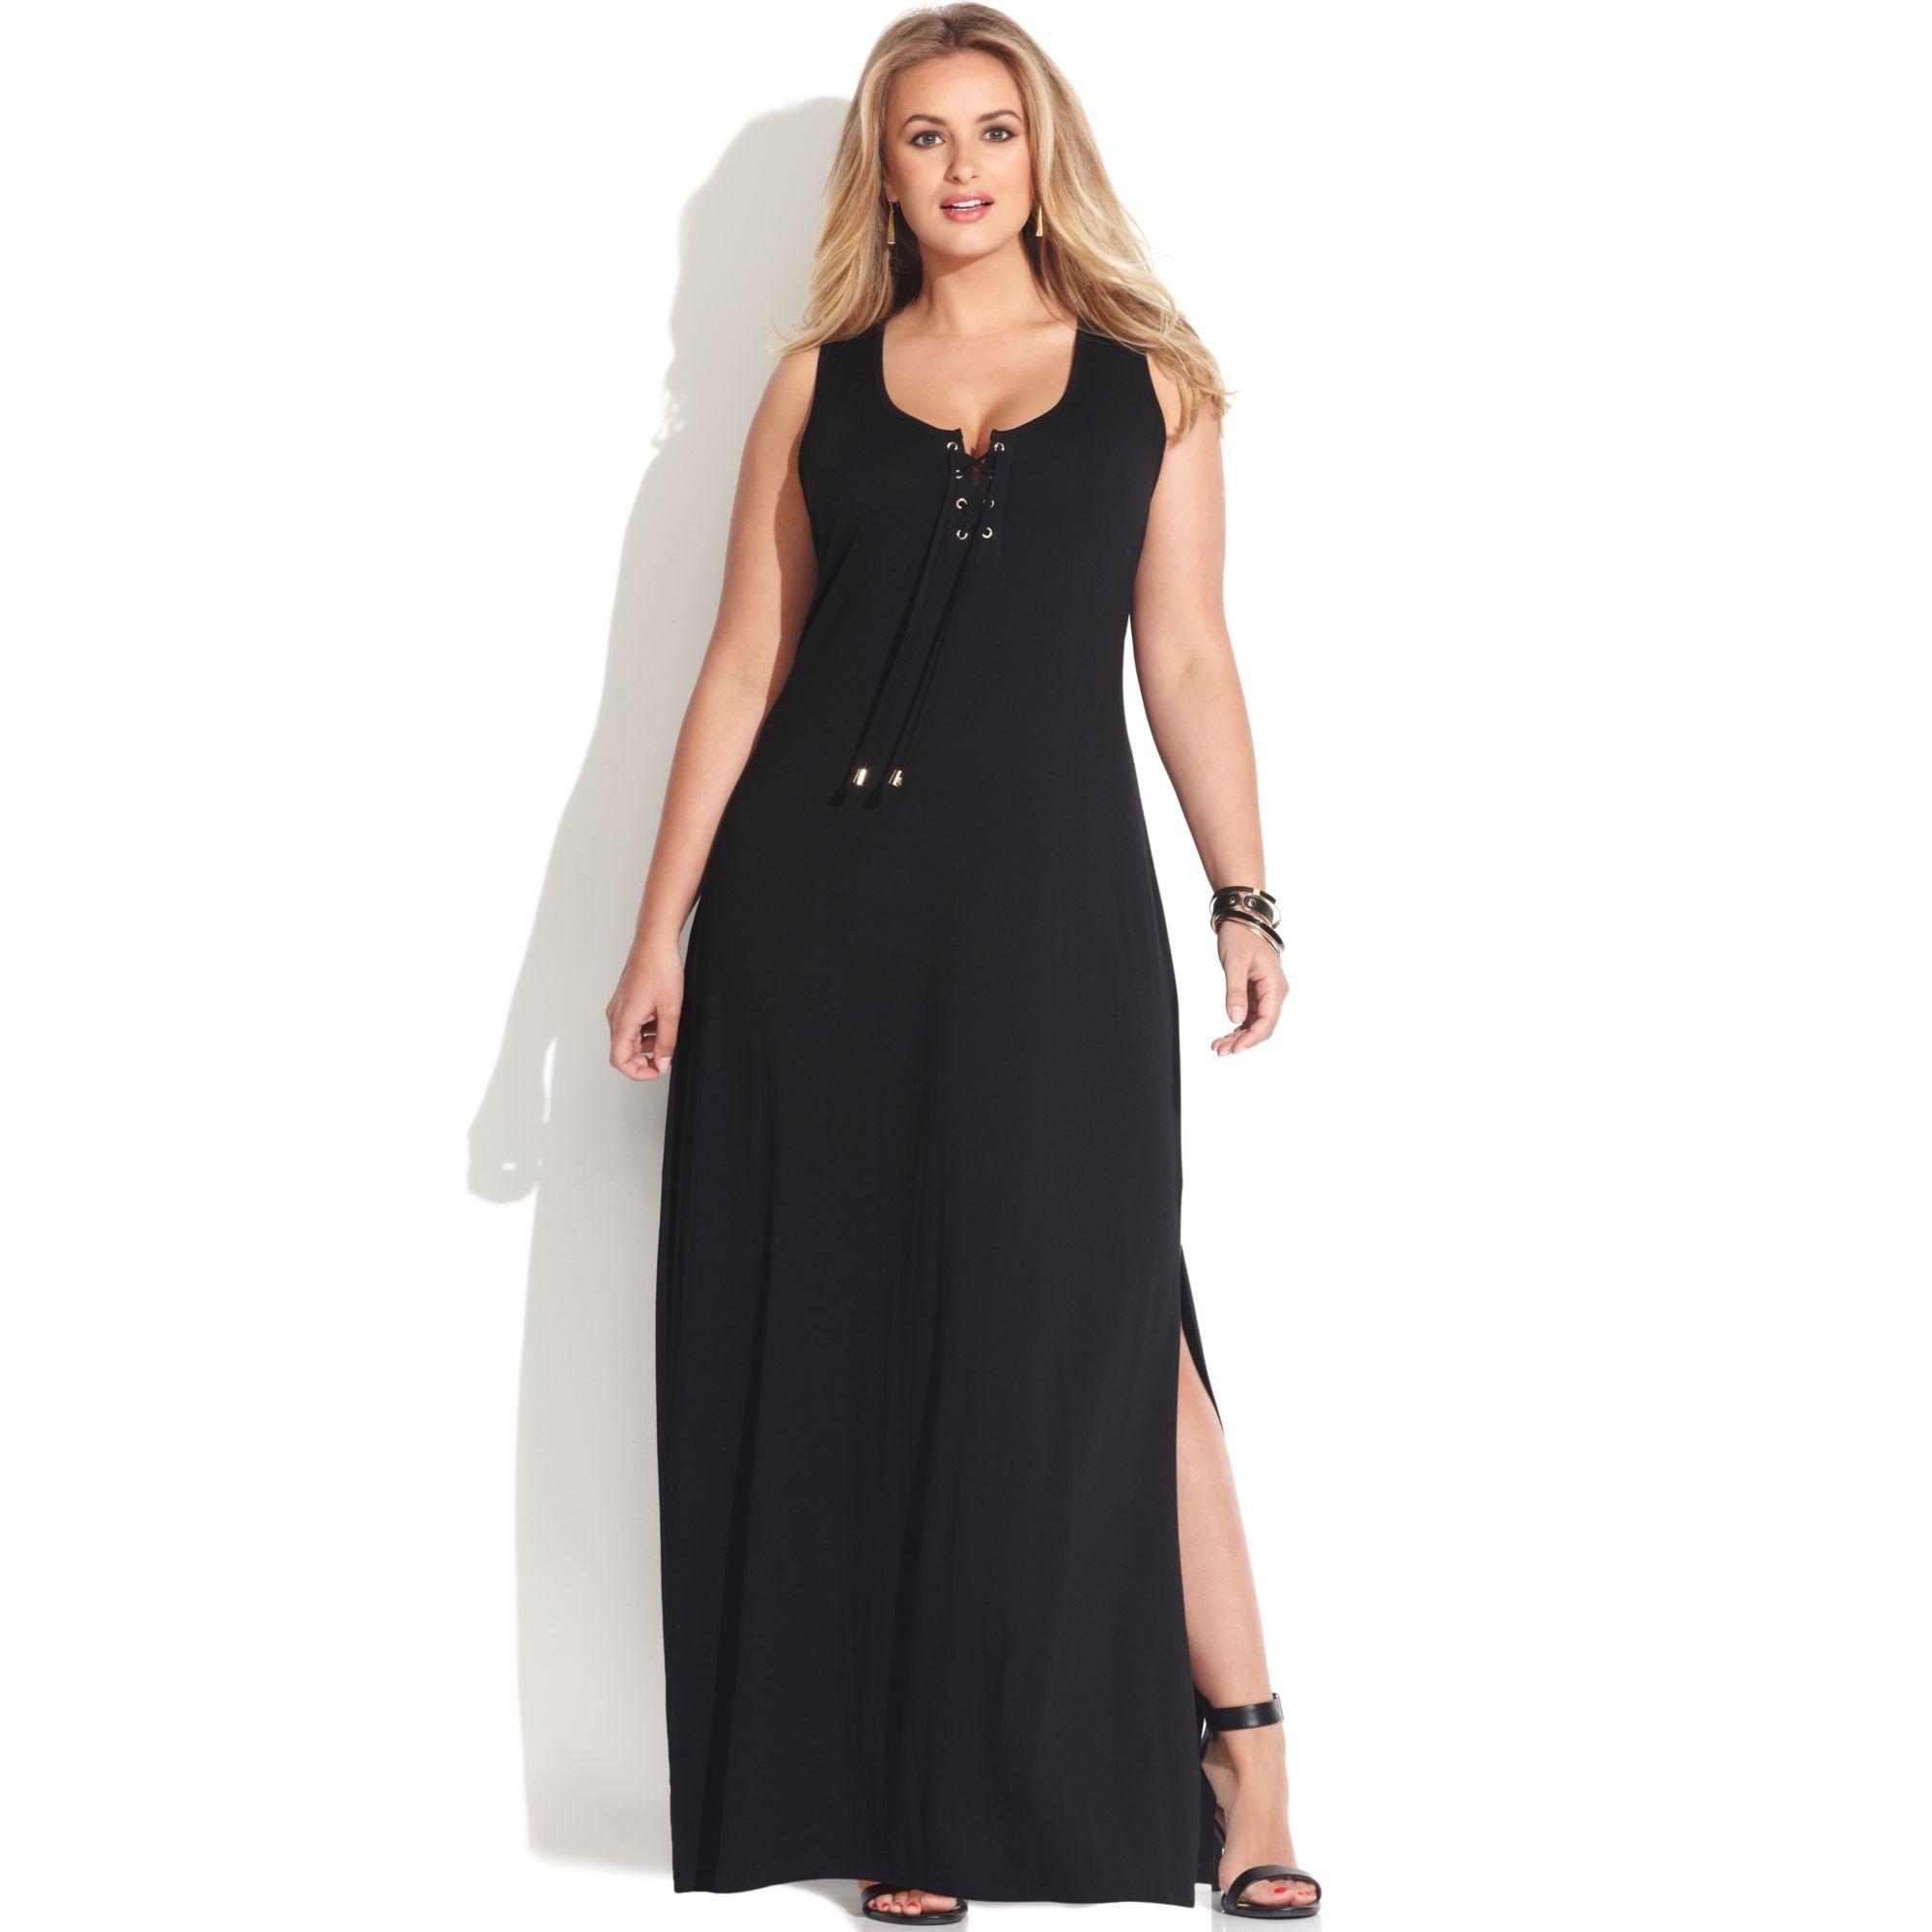 Plus Size Strapless Summer Dress